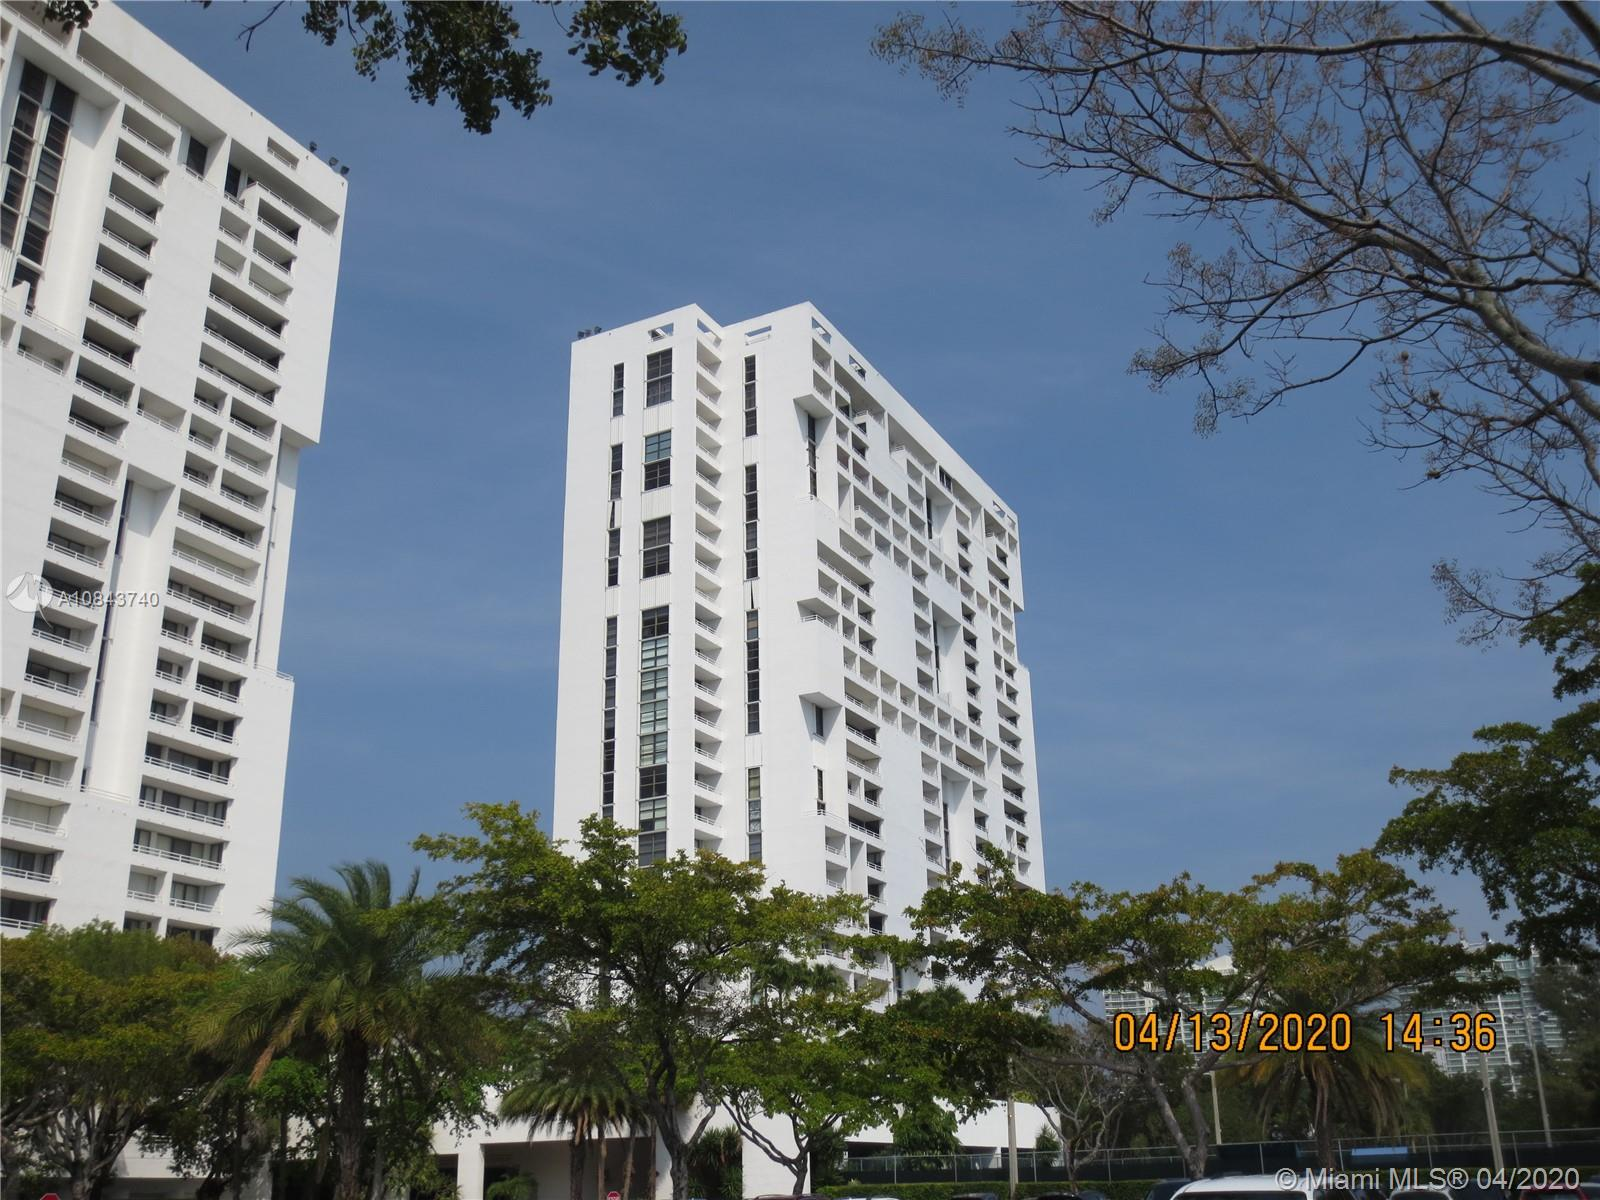 Delvista Towers image #2